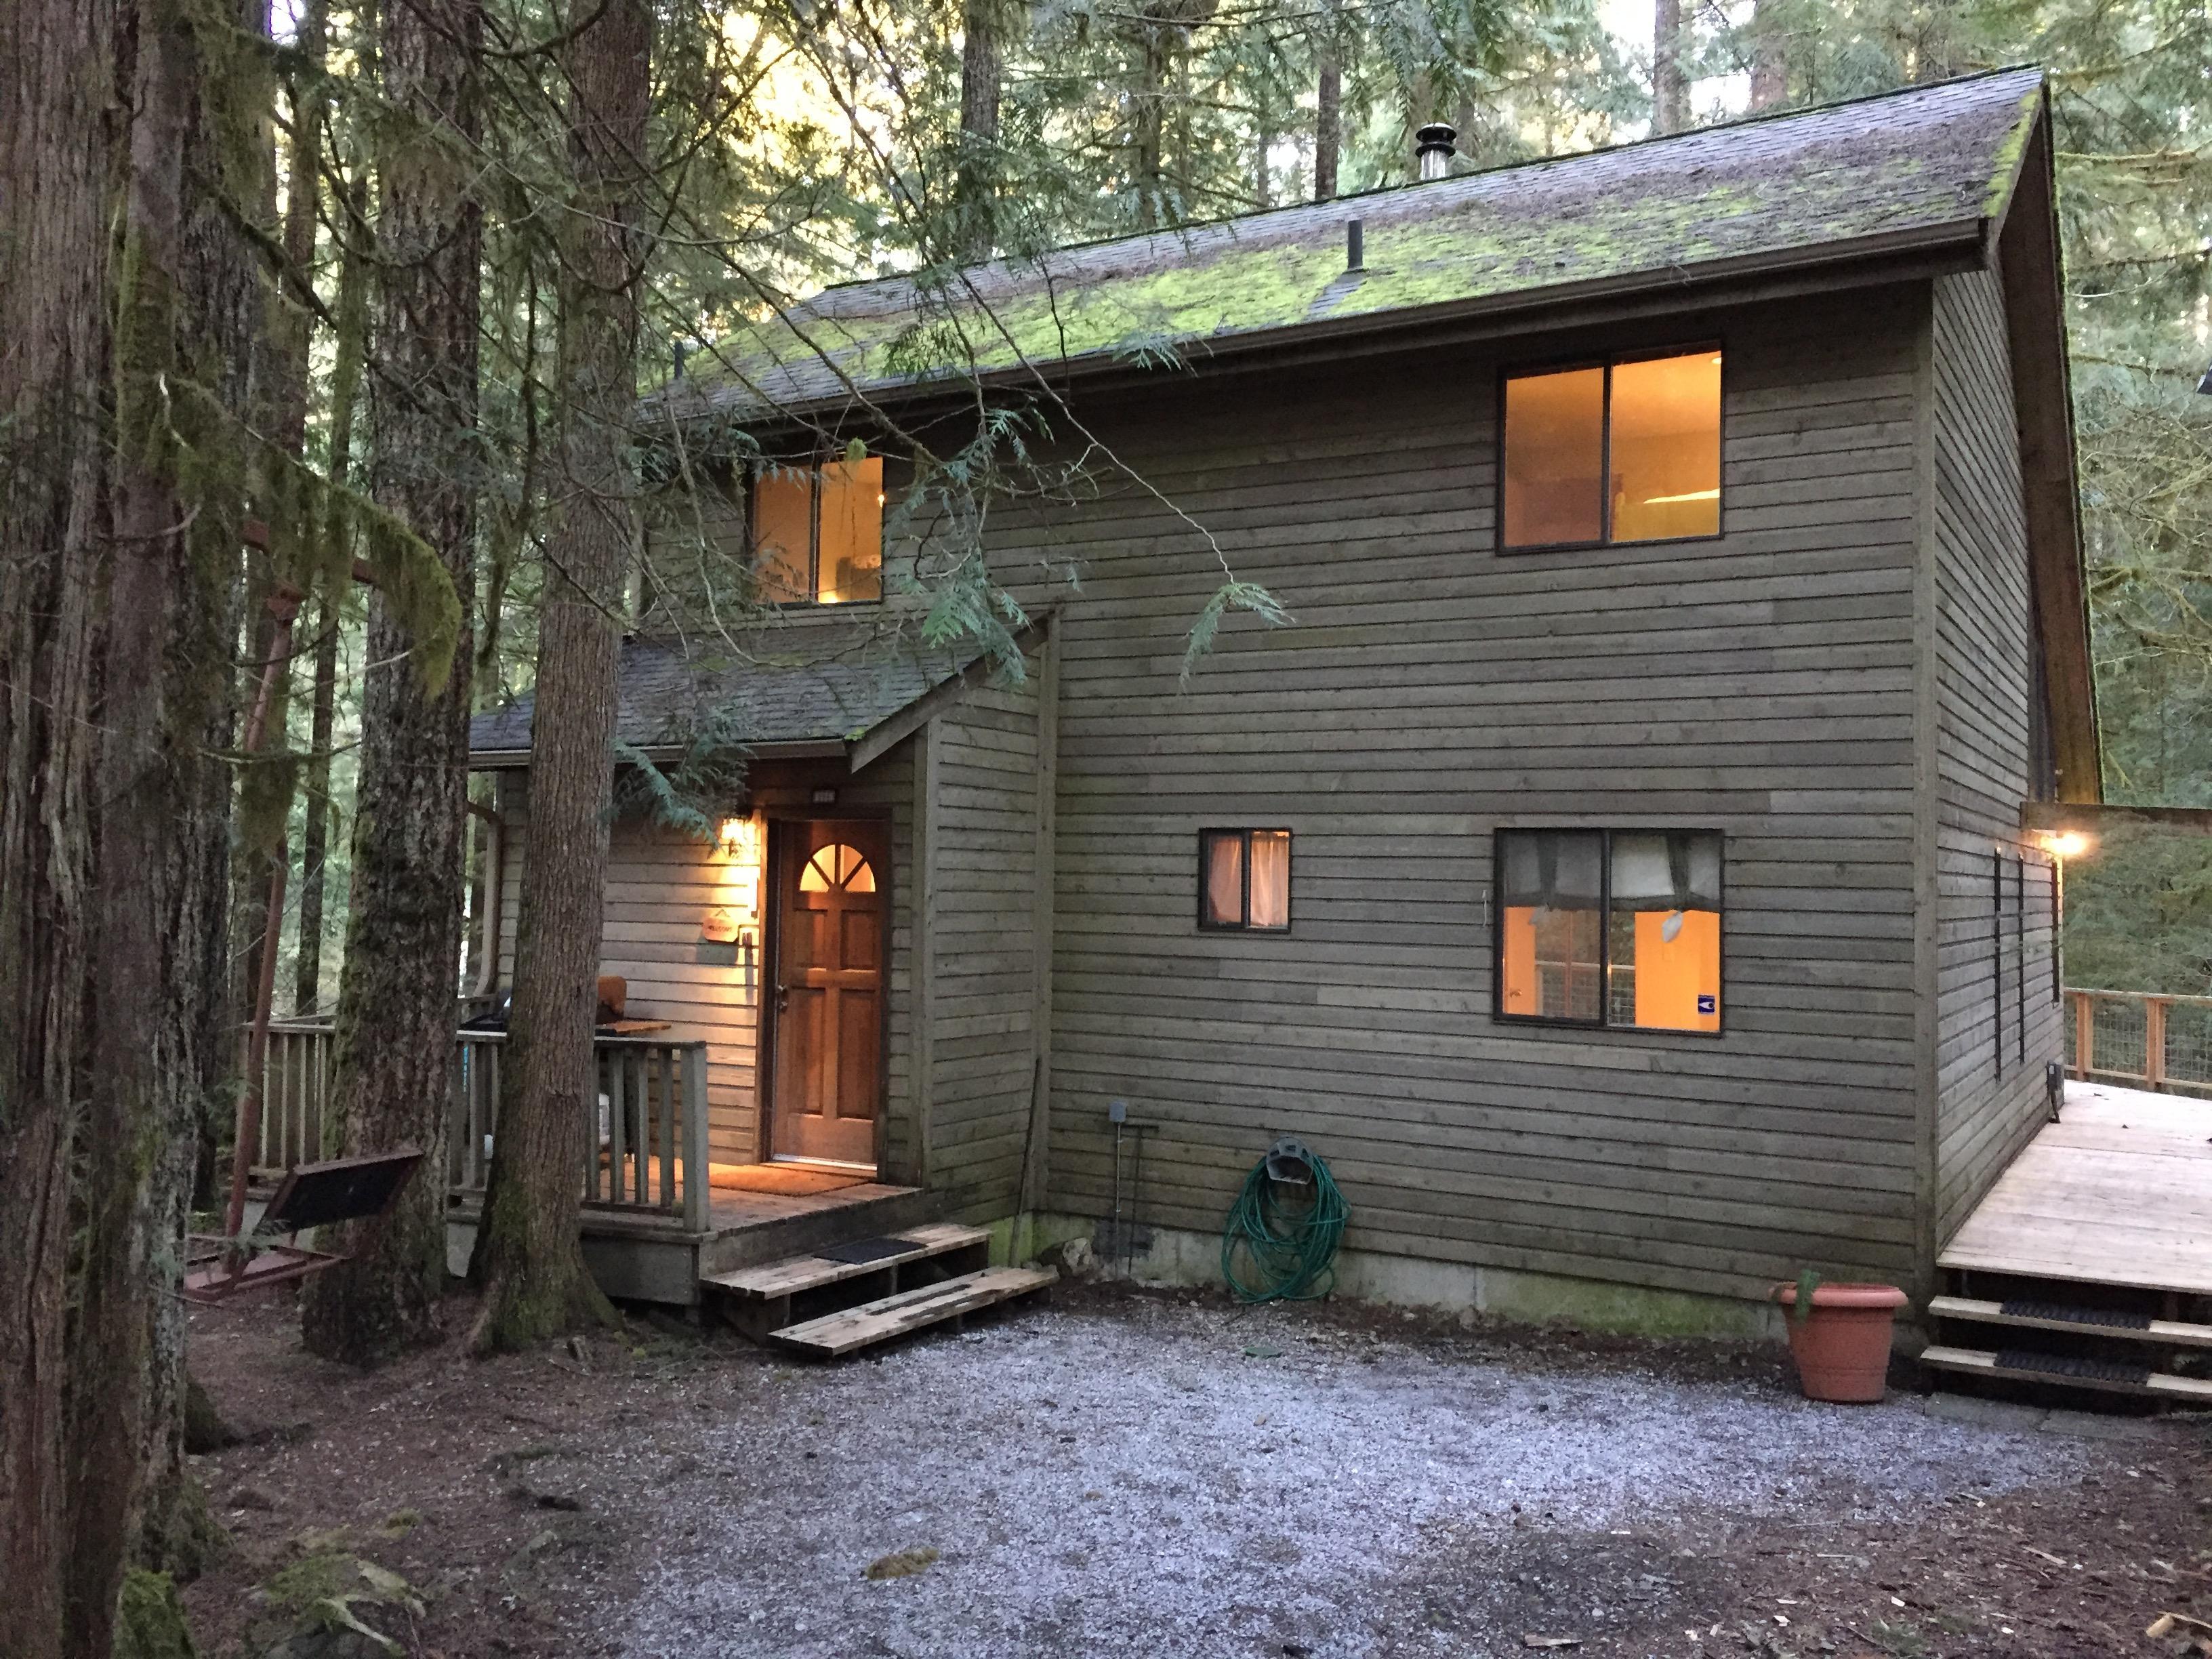 Apartment Mt  Baker Lodging Cabin  55 - HOT TUB  WOOD STOVE  BBQ  SLEEPS 10  photo 3998984